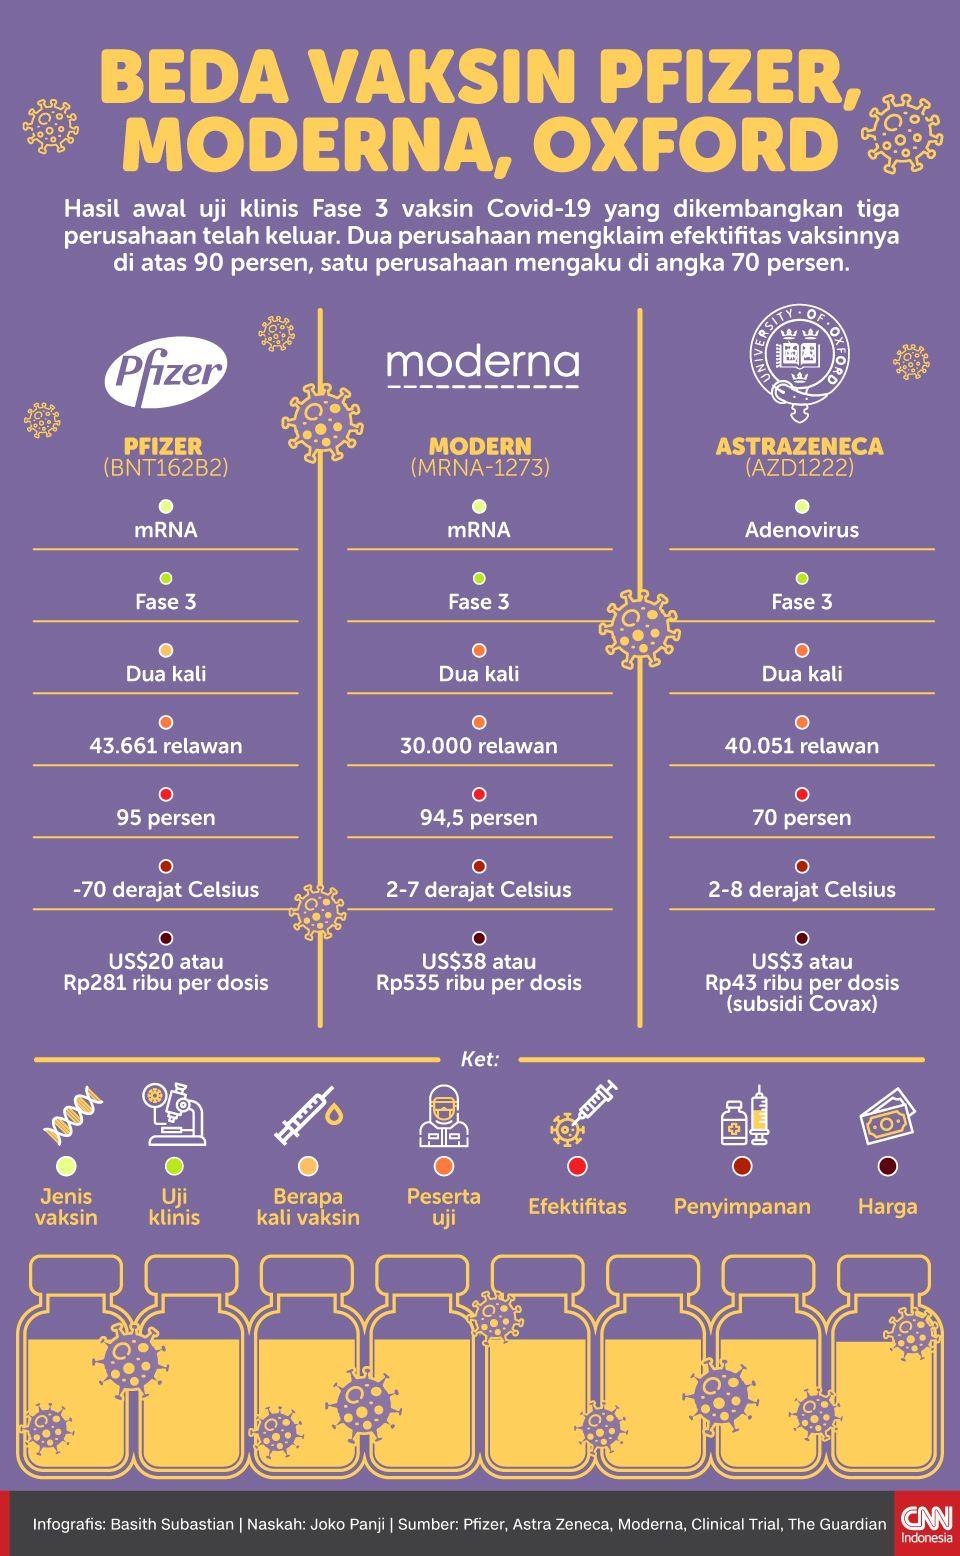 Infografis Beda Vaksin Pfizer, Moderna, Oxford